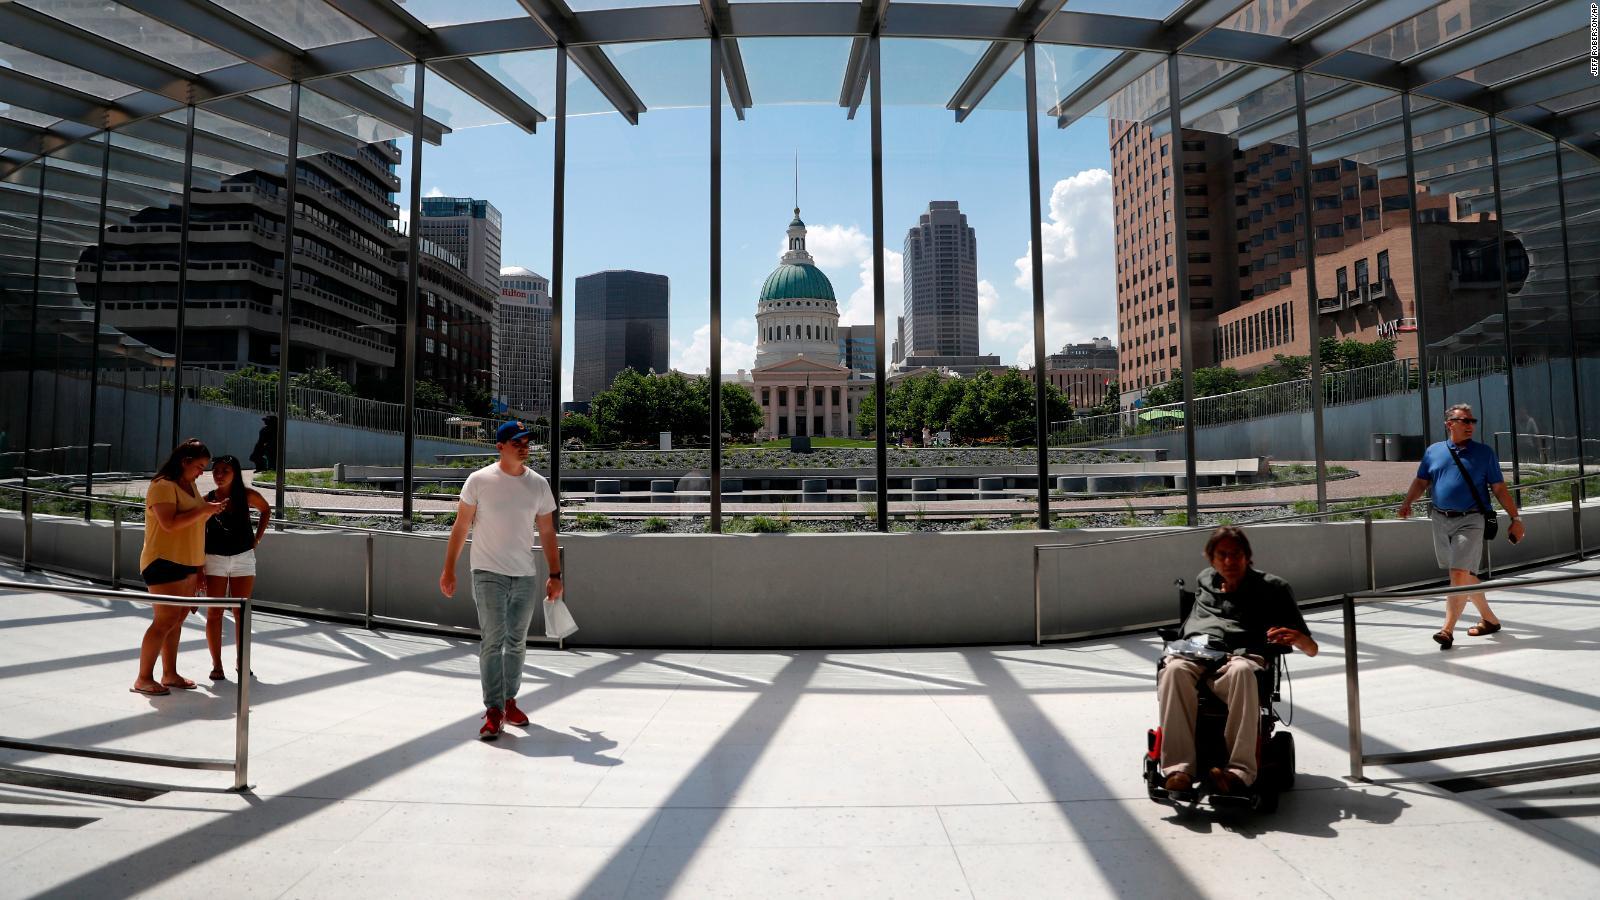 Gateway Arch Museum Reopening In St Louis Missouri Cnn Travel